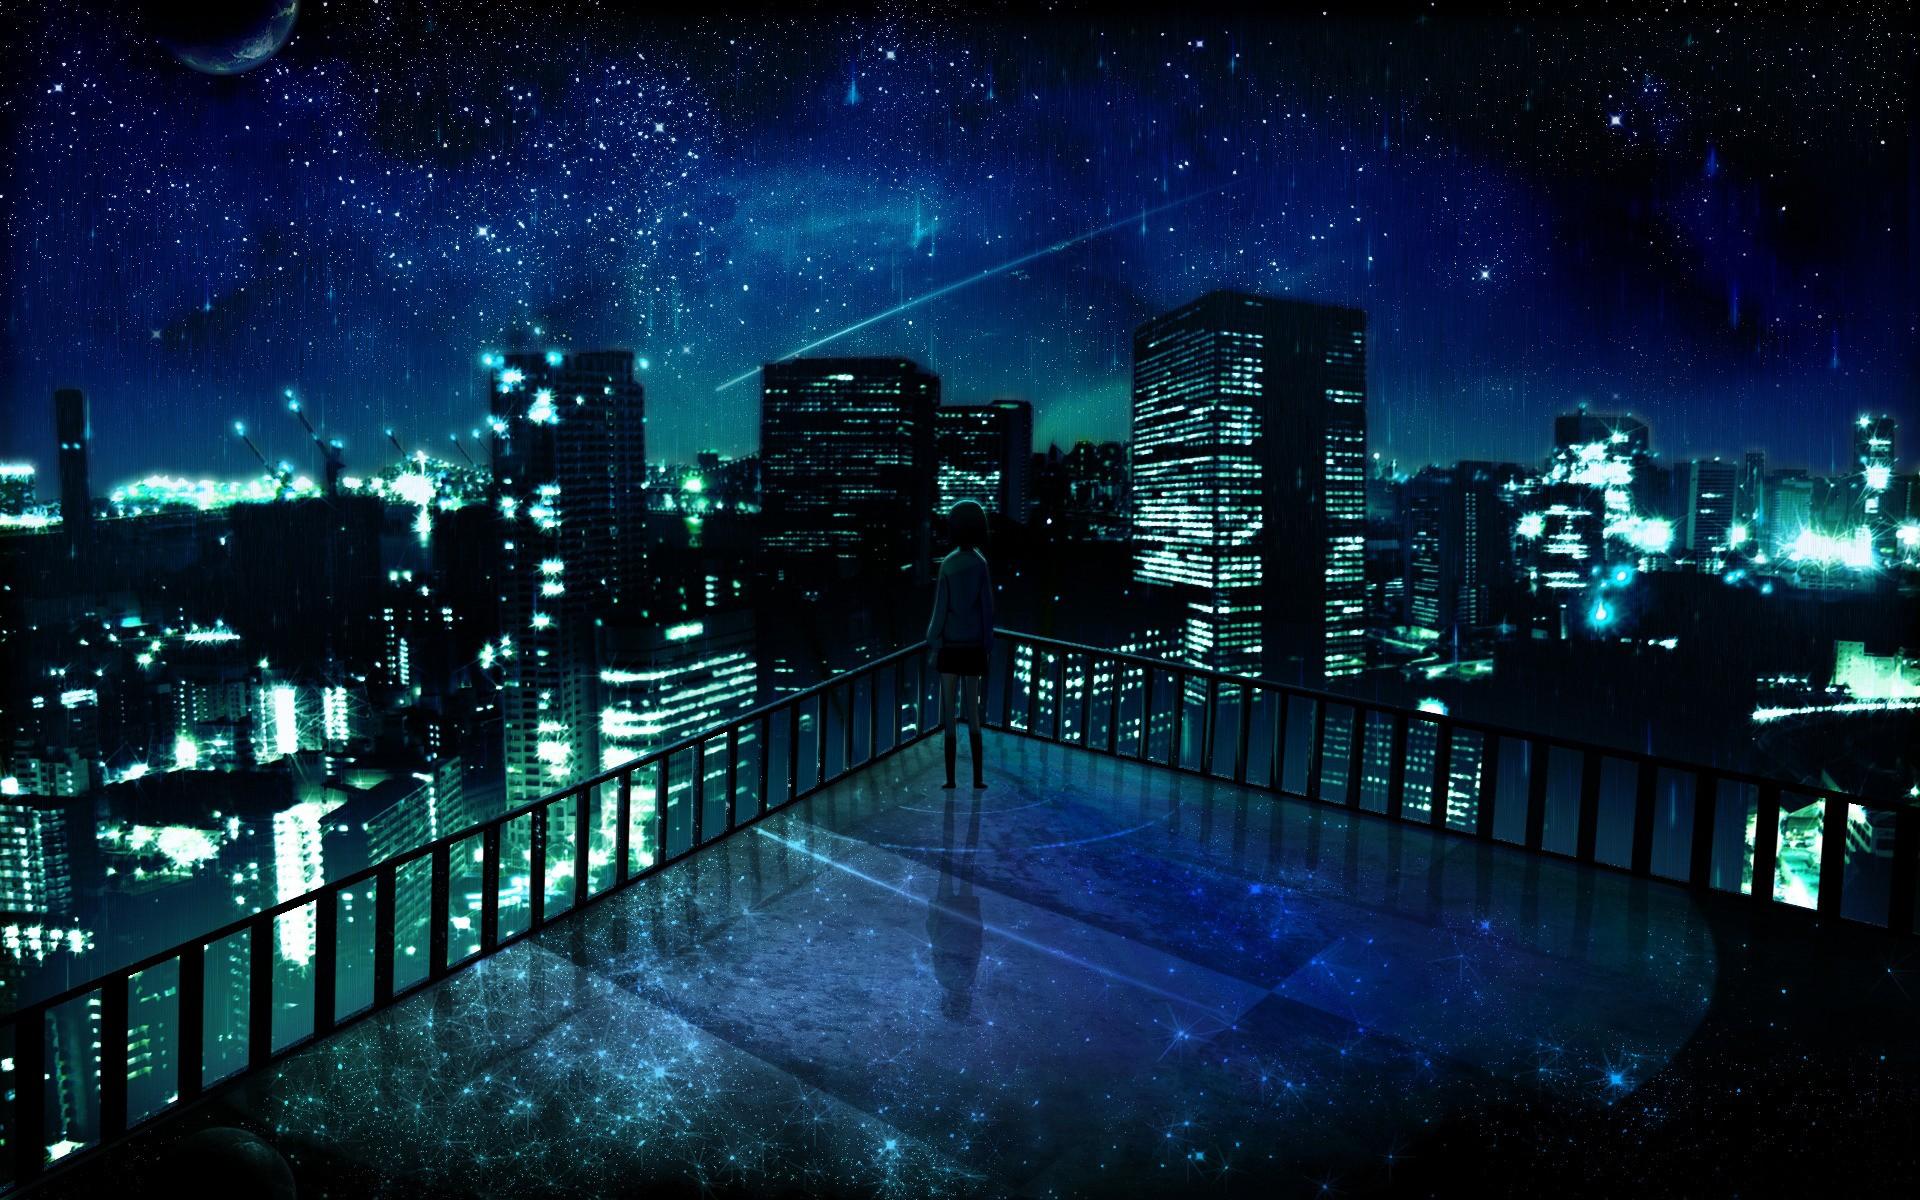 Night Alone Wallpaper Night Stars Alone Balcony